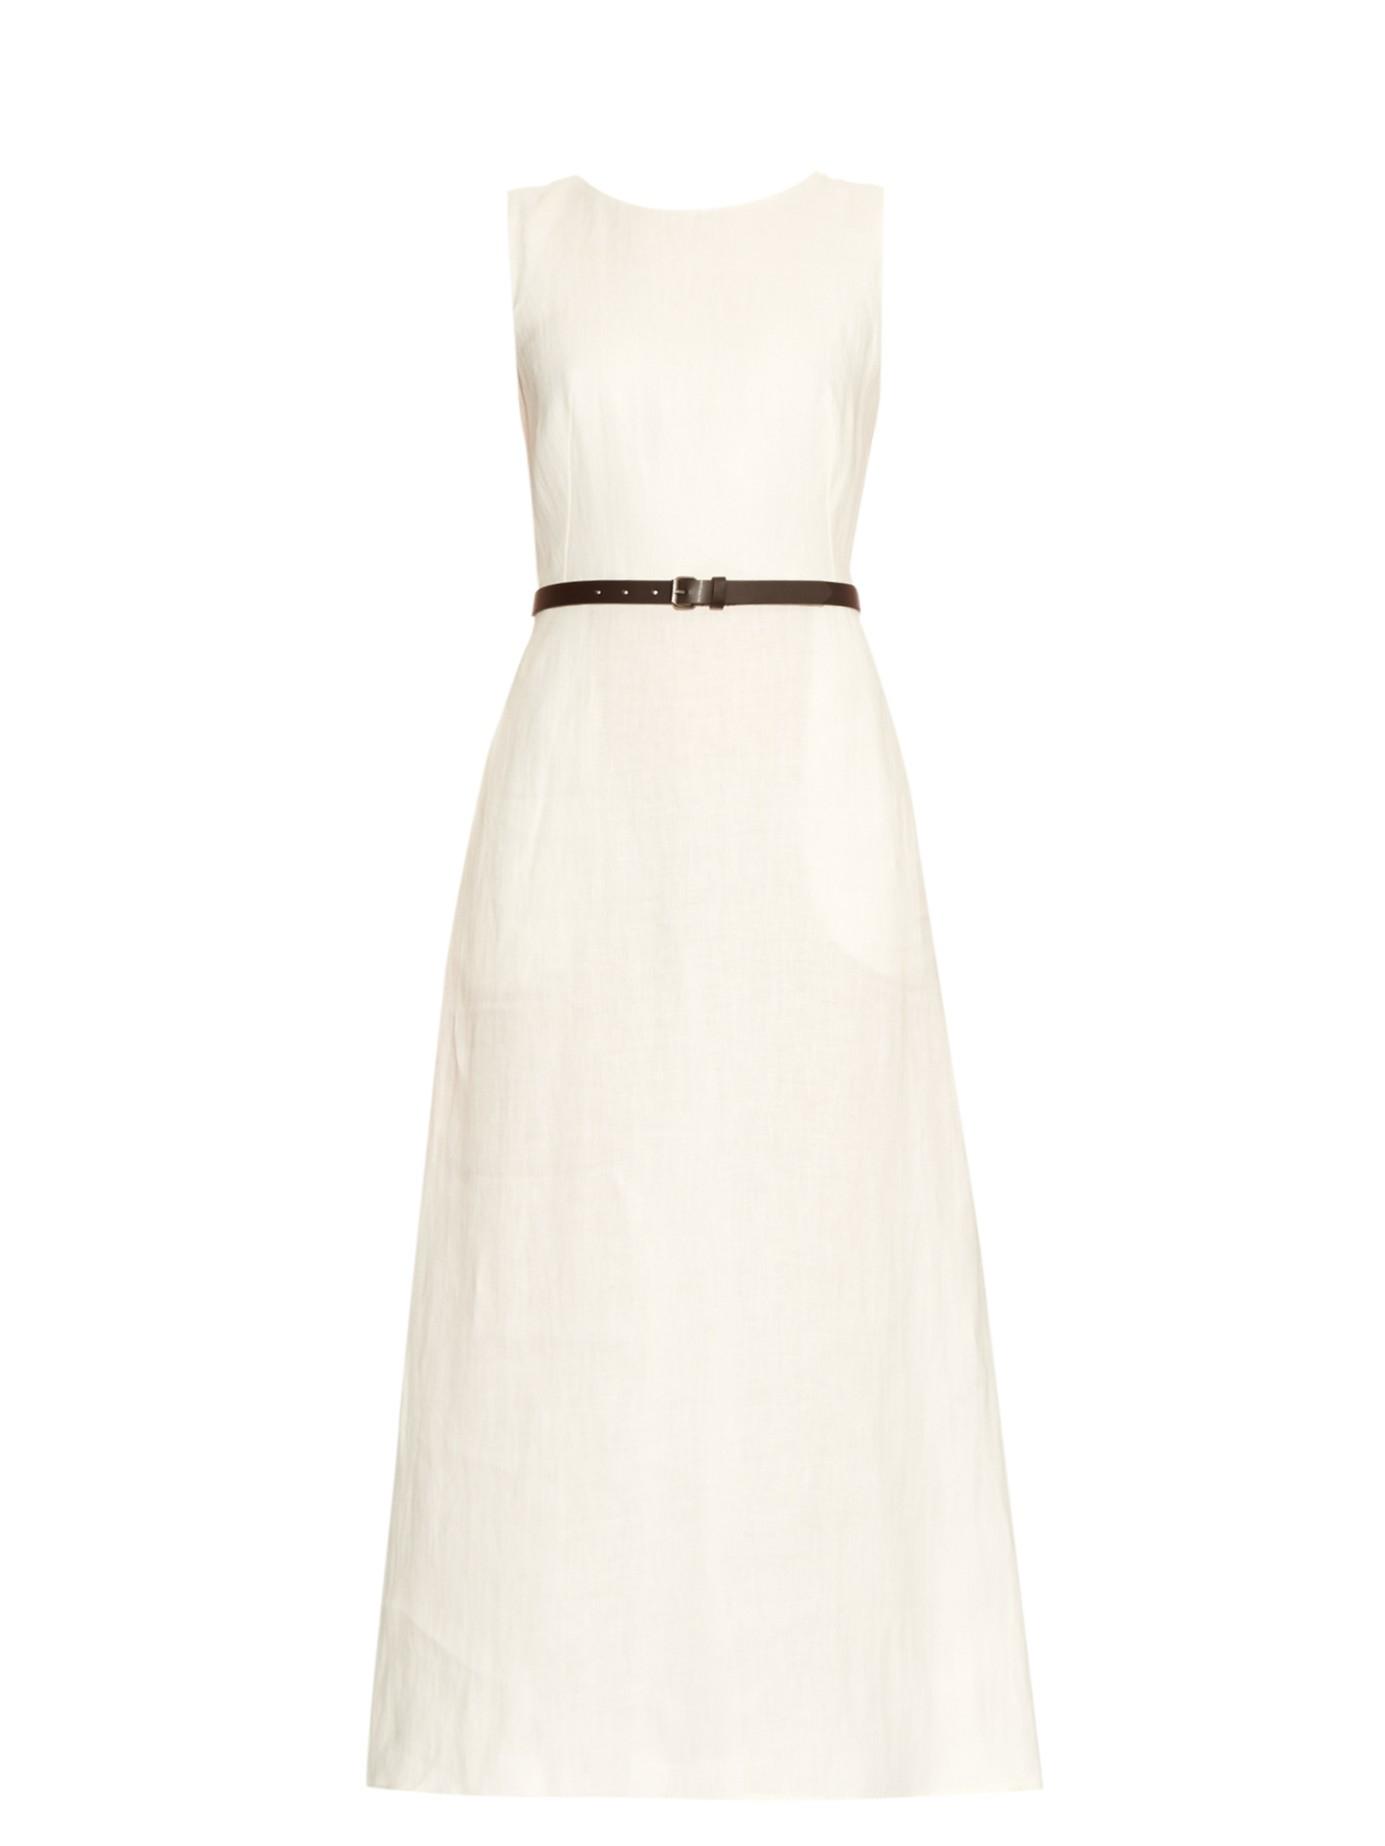 0c8844a975 Lyst - Weekend by Maxmara Amico Dress in White